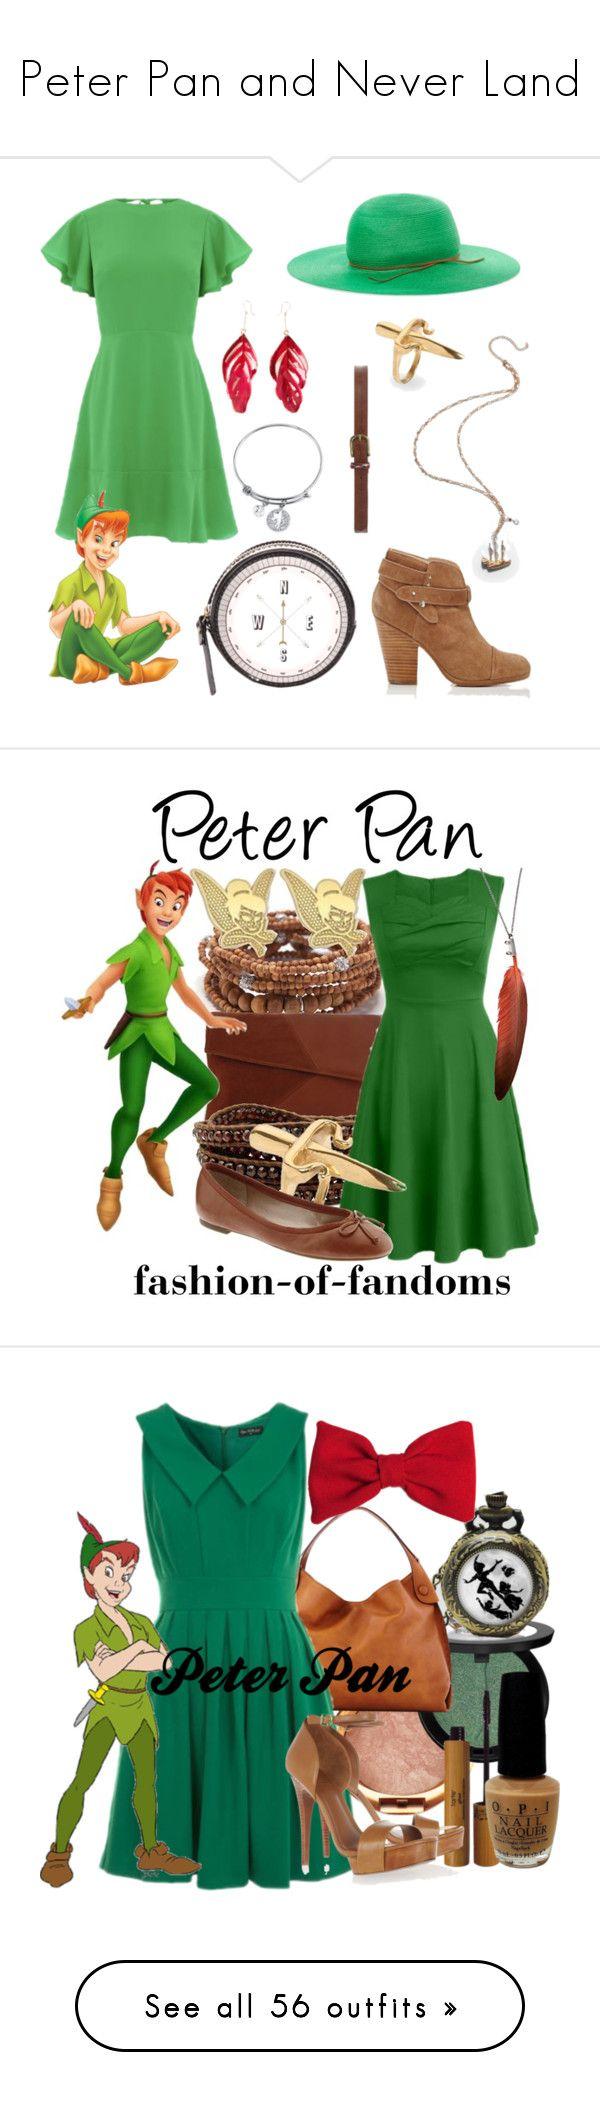 """Peter Pan and Never Land"" by megdelaina ❤ liked on Polyvore featuring Warehouse, Aurélie Bidermann, LeiVanKash, Belk Silverworks, rag & bone, House of Lafayette, Kate Spade, Dorothy Perkins, Lisa Freede and Rare London"